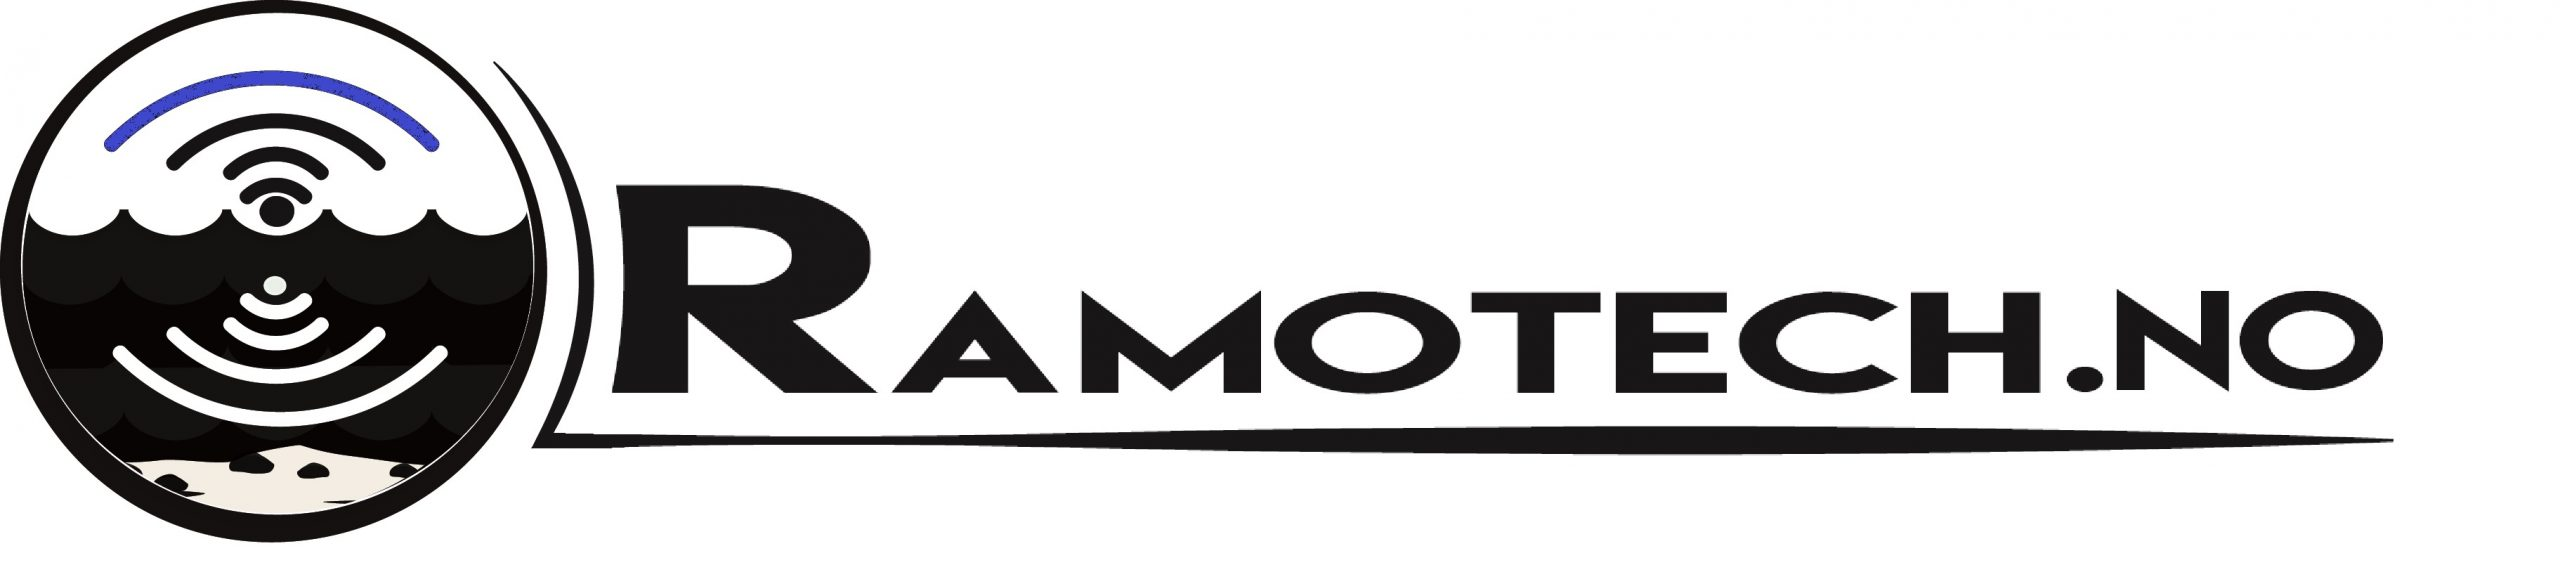 Ramotech AS